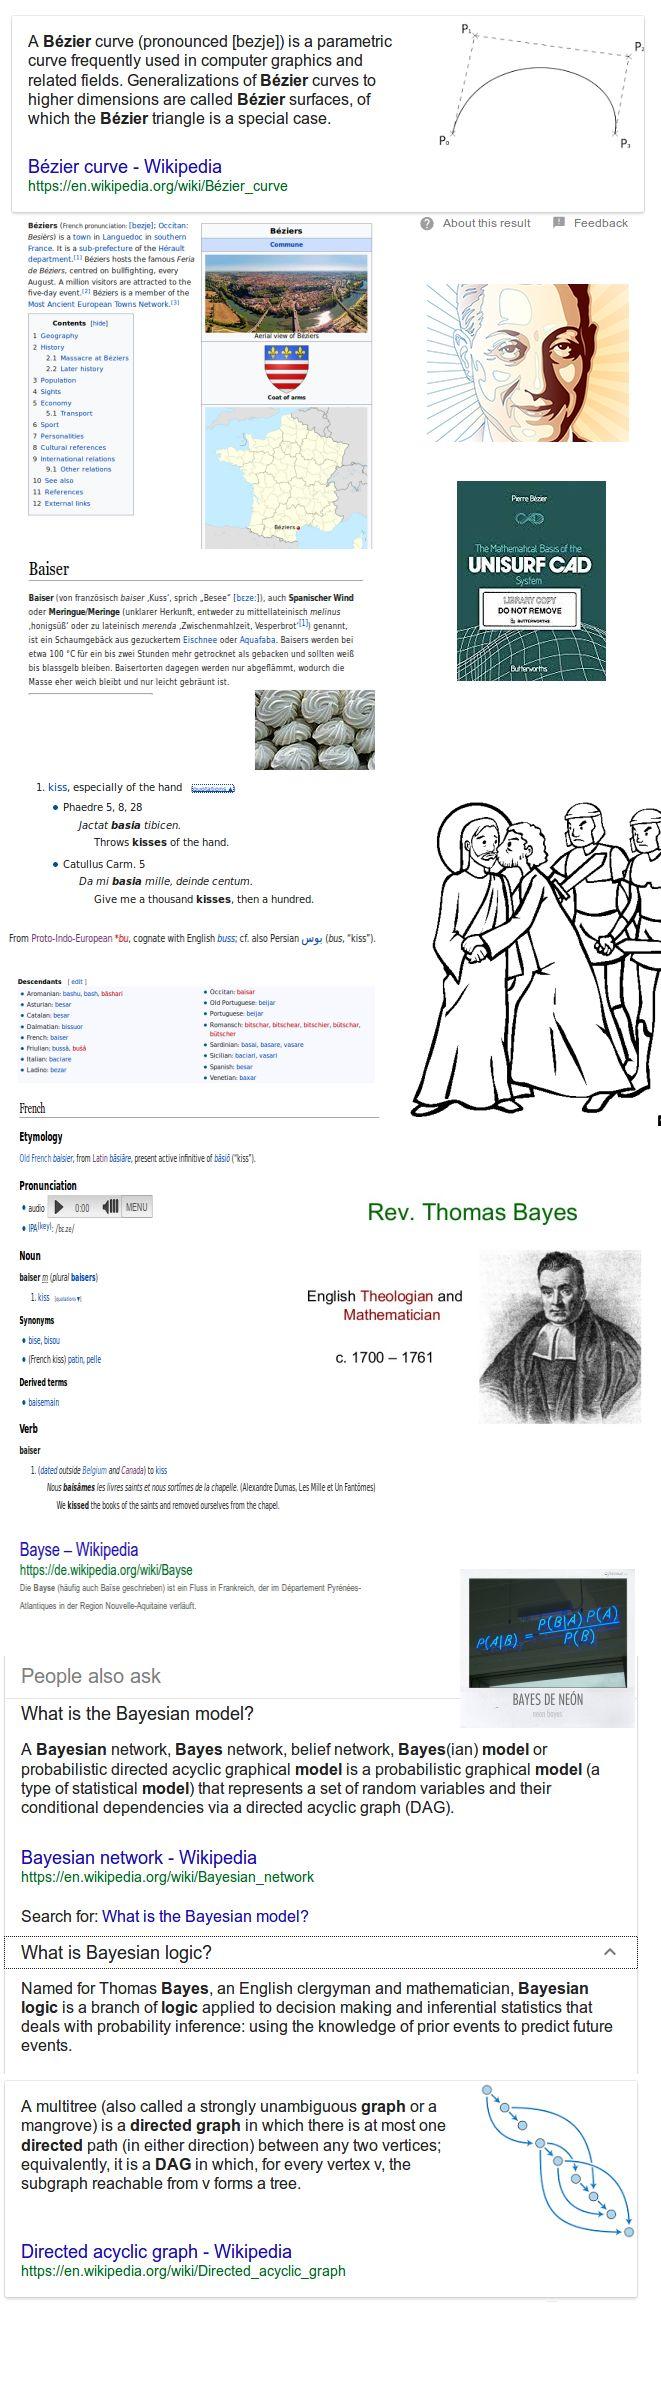 "bosuyo ܒܨ̈ܘܝܐ (bswya in Syriac) researcher, seeker of physical presence; Persian بوس • (bus ""kiss"") Greek: φιλησω, philēsō, a single kiss Syriac /Aramaic נשוק | ܕ݁ܢܳܫܶܩ | nsuq : eg Pierre Bezier (multiple radii curves, engineer) Thomas Bayes (probabilities and chance, economist) and baiser, a French meringue desert or versuch-zuchtig tempter-addict embrace http://www.dukhrana.com/peshitta/analyze_verse.php?lang=en&verse=Matthew+26:48&source=ubs&font=Estrangelo+Edessa&size=125%"